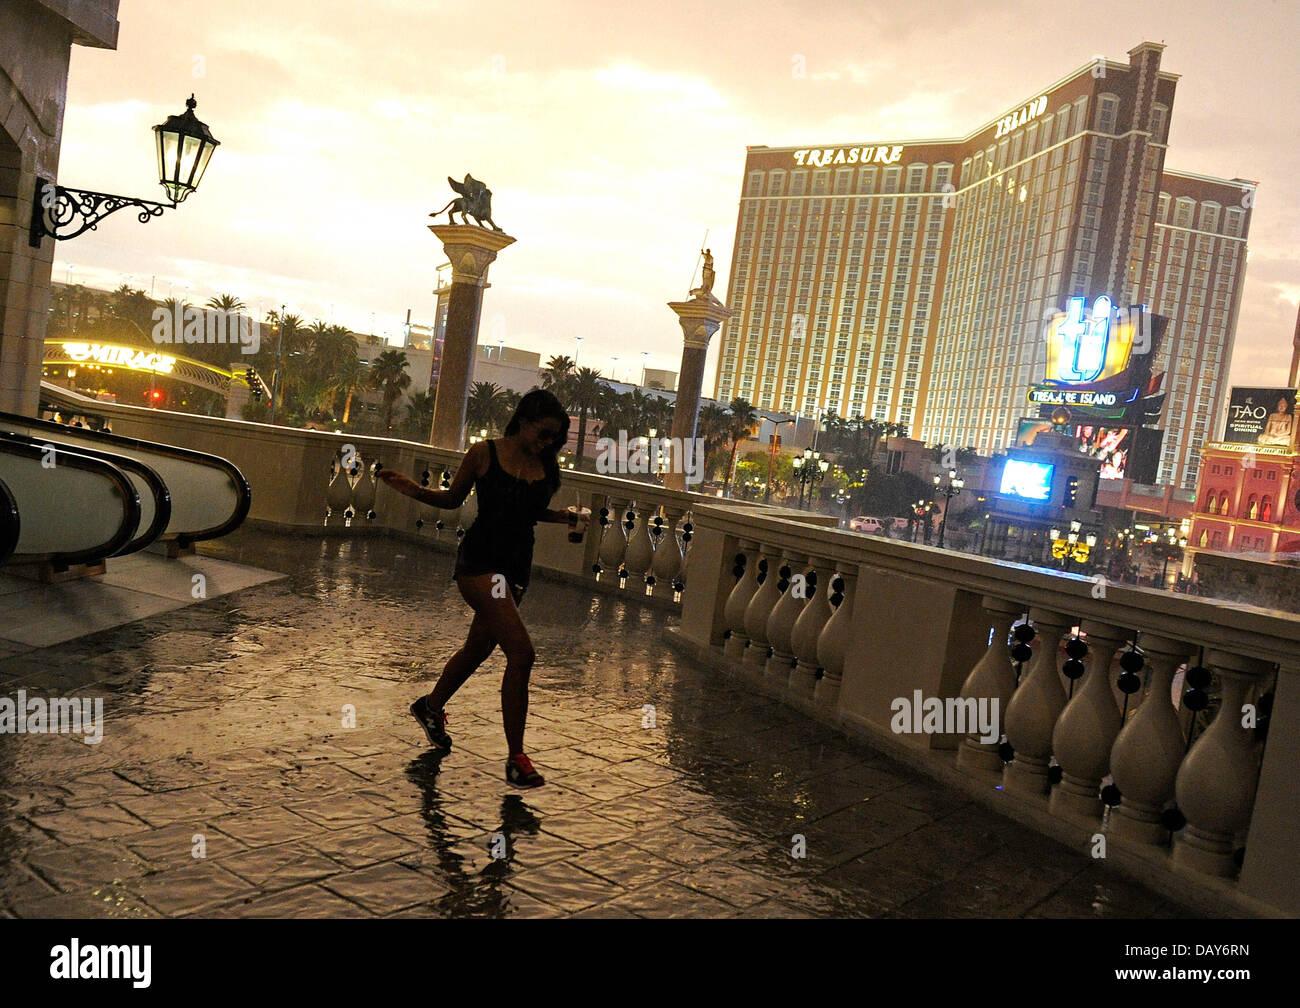 Las Vegas Nevada Usa 19th July 2013 A Woman Races Across A